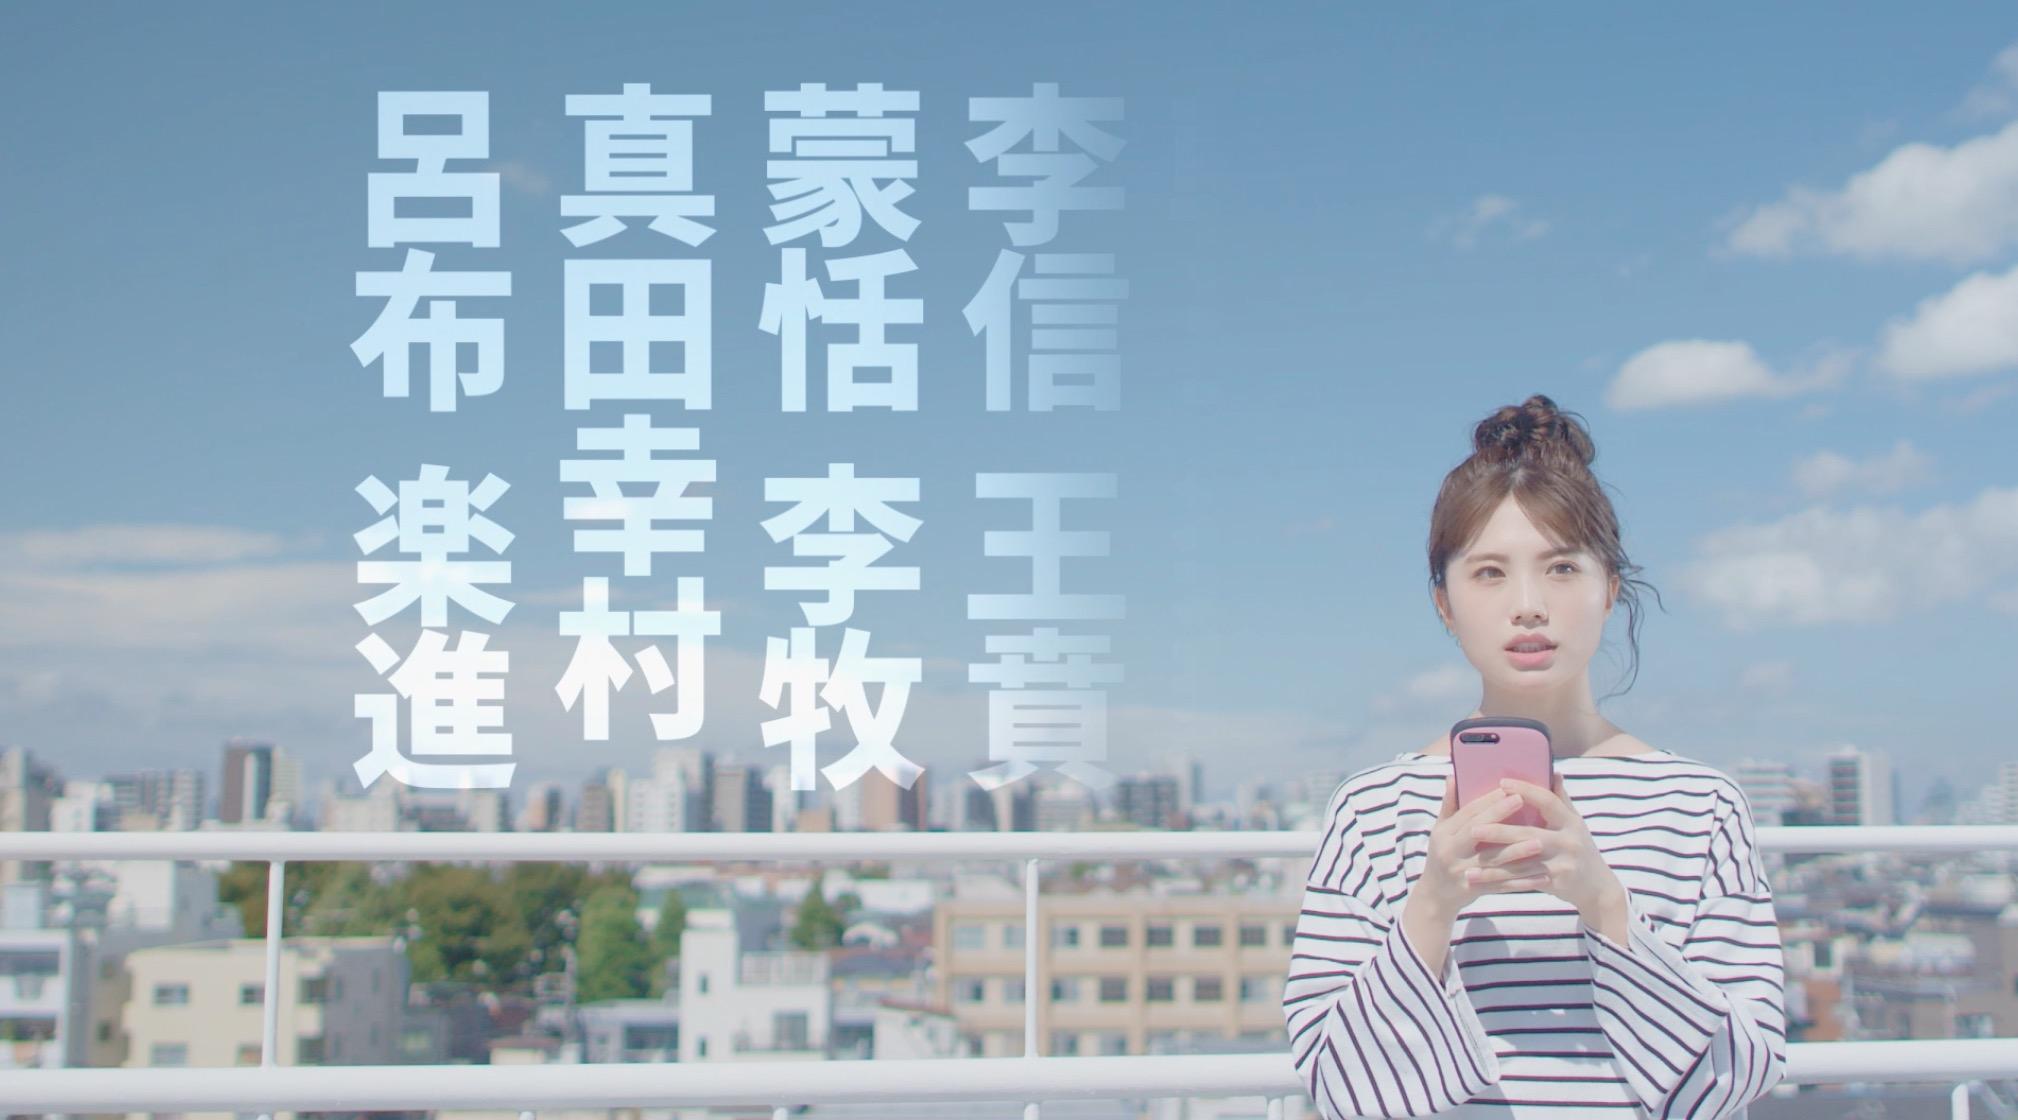 CM注目美女:半澤楓】CMで武将をつぶやきまくる美少女は何者?「女子 ...